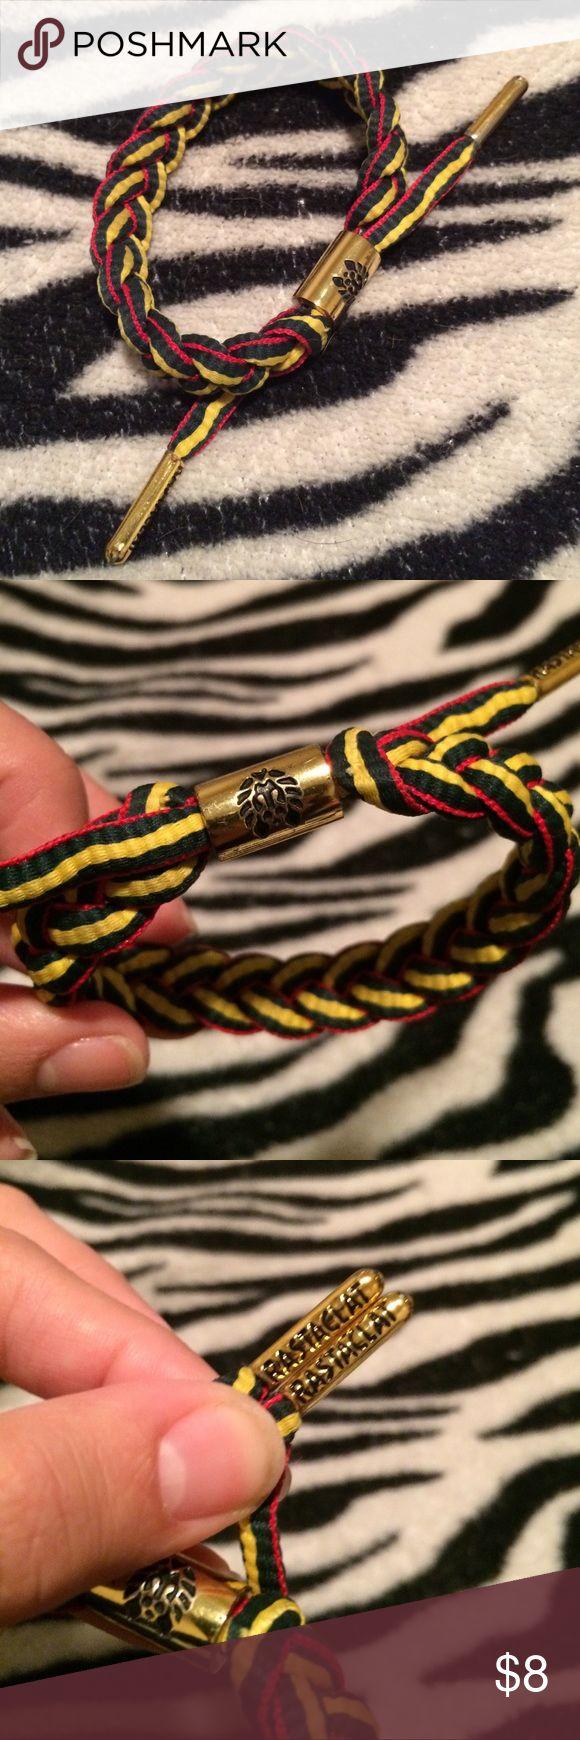 Rastaclat rasta Bracelet Rastaclat adjustable braided rasta colored bracelet Rastaclat Jewelry Bracelets